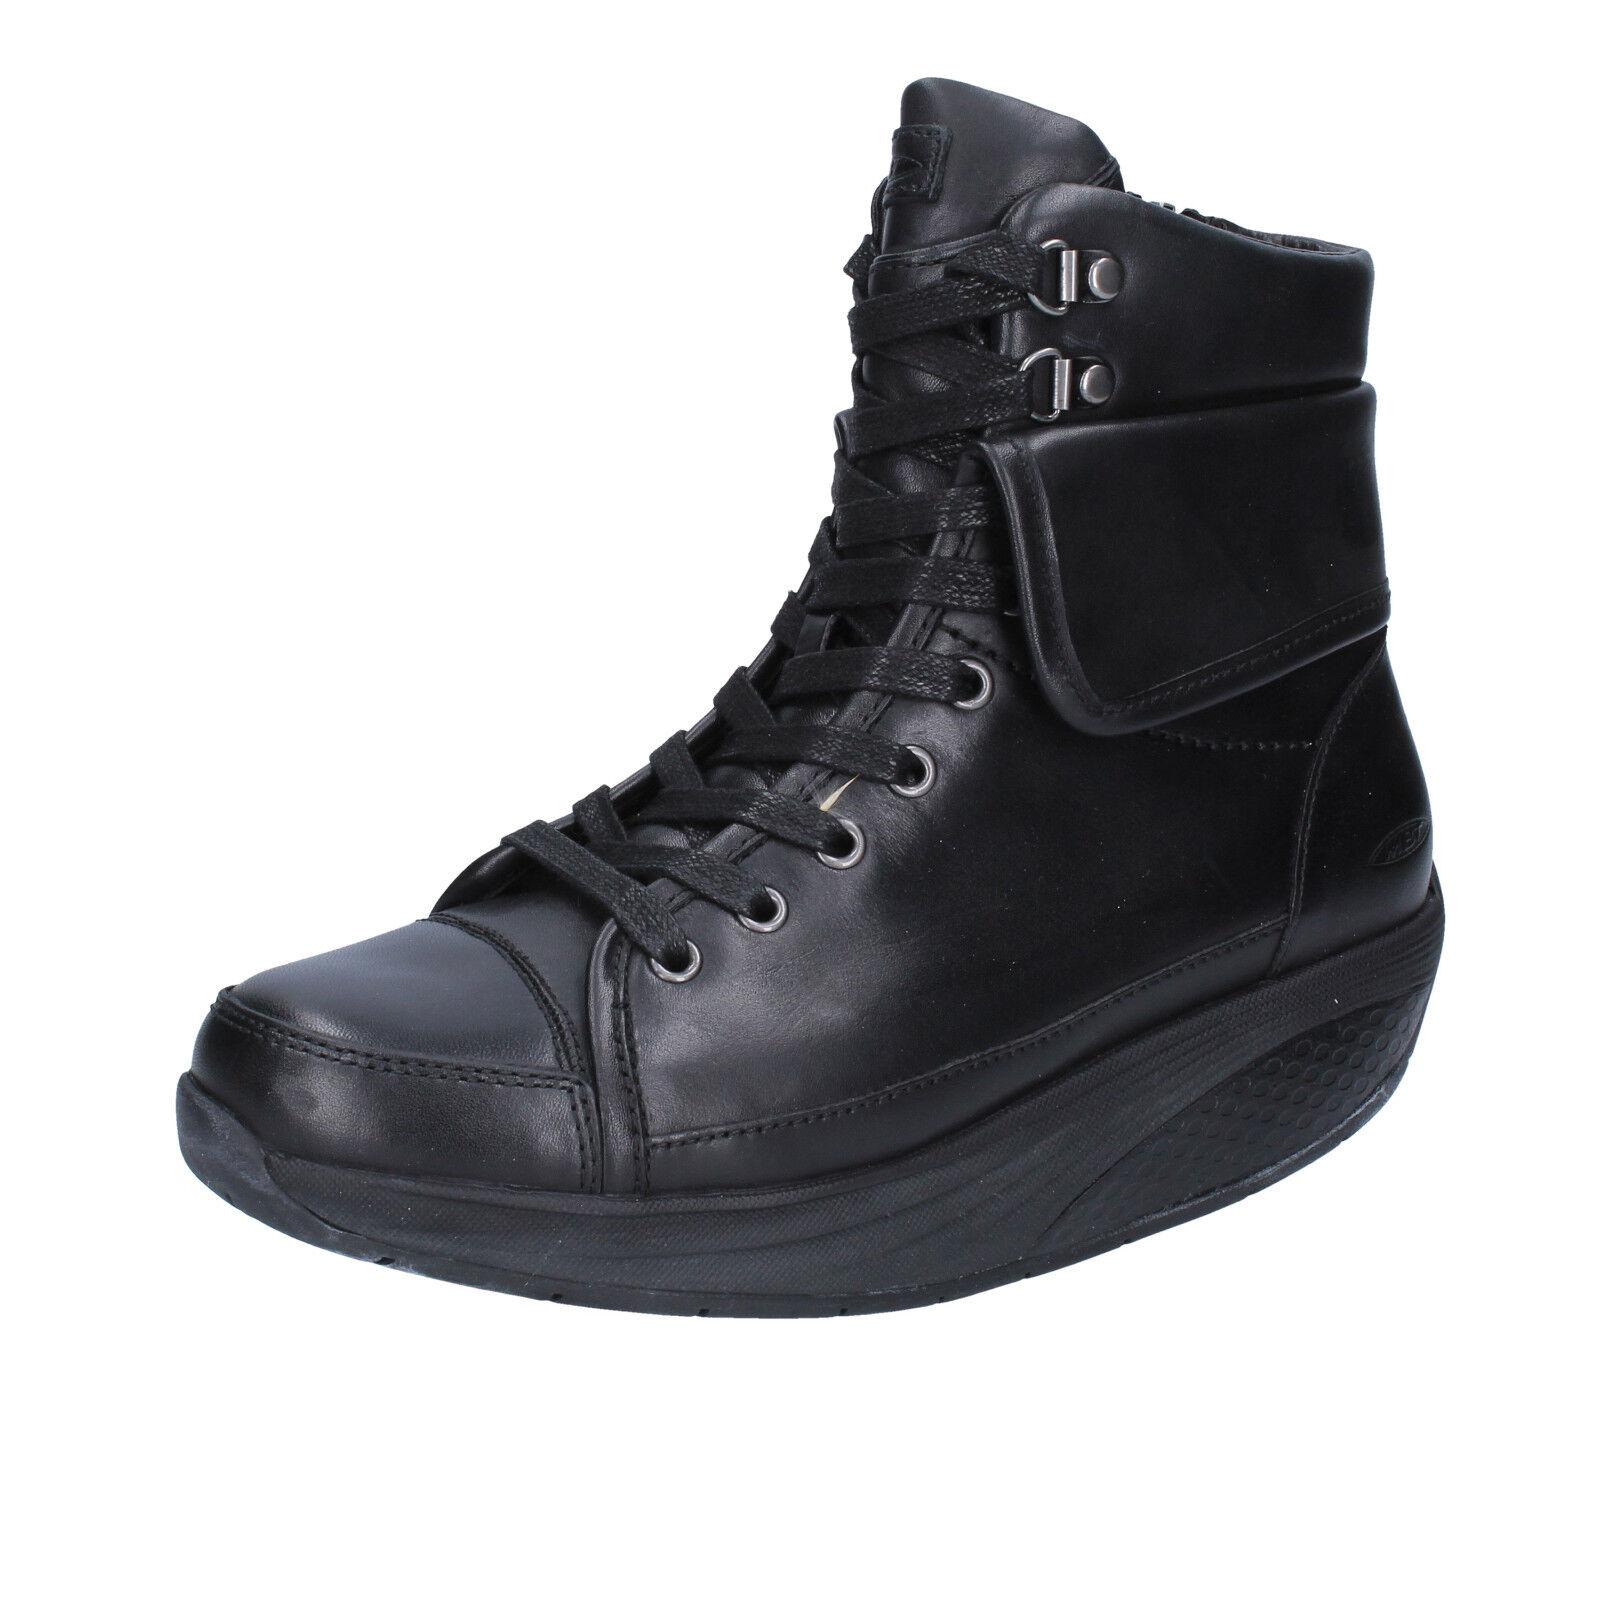 scarpe donna MBT 39 EU stivaletti nero pelle BT206-39